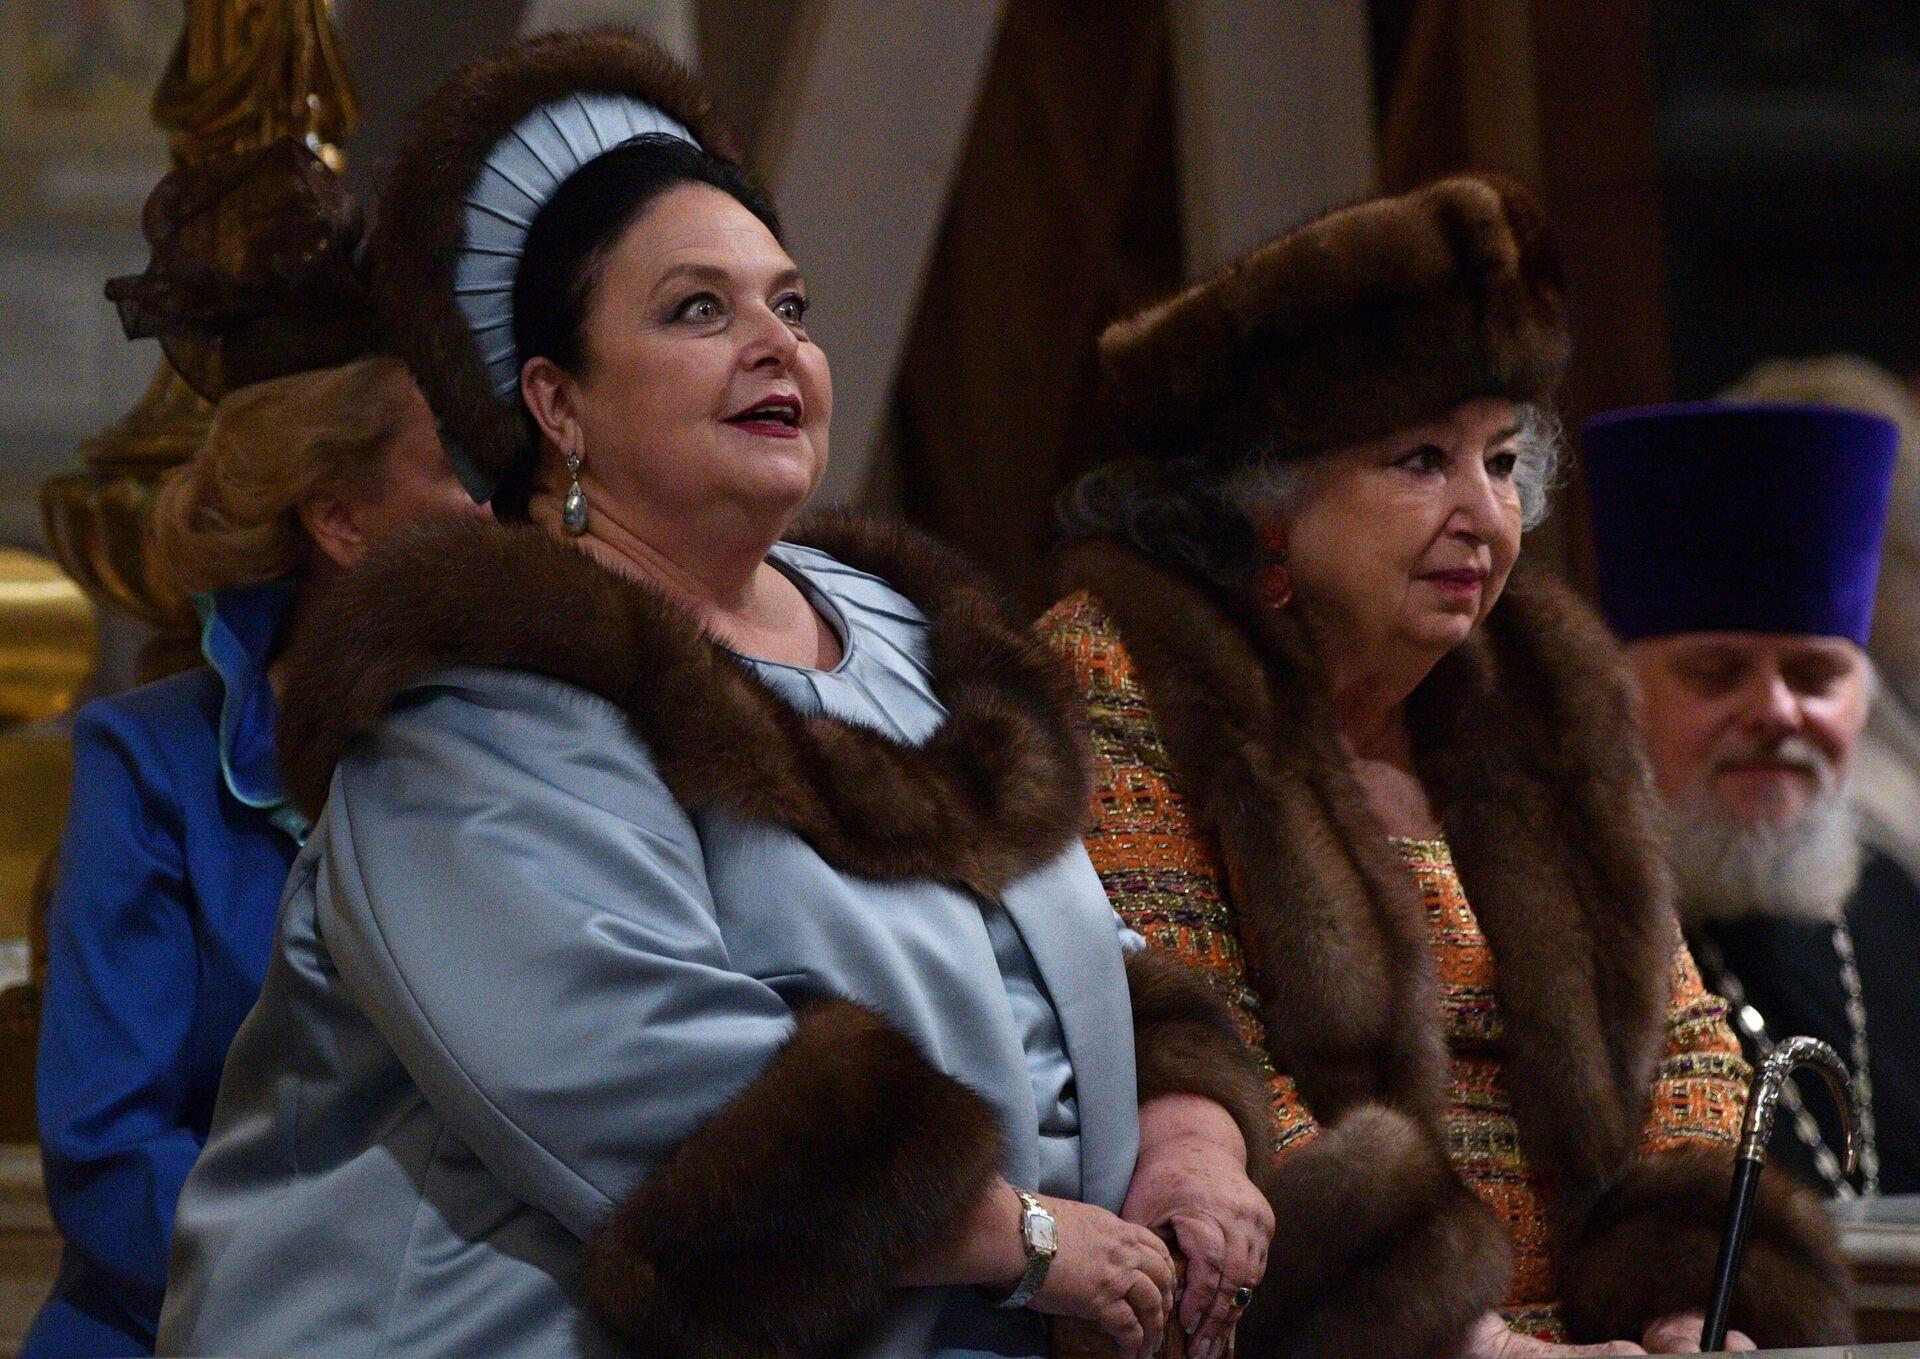 La gran duquesa María Vladímirovna Románova, madre de Jorge  - Sputnik Mundo, 1920, 02.10.2021